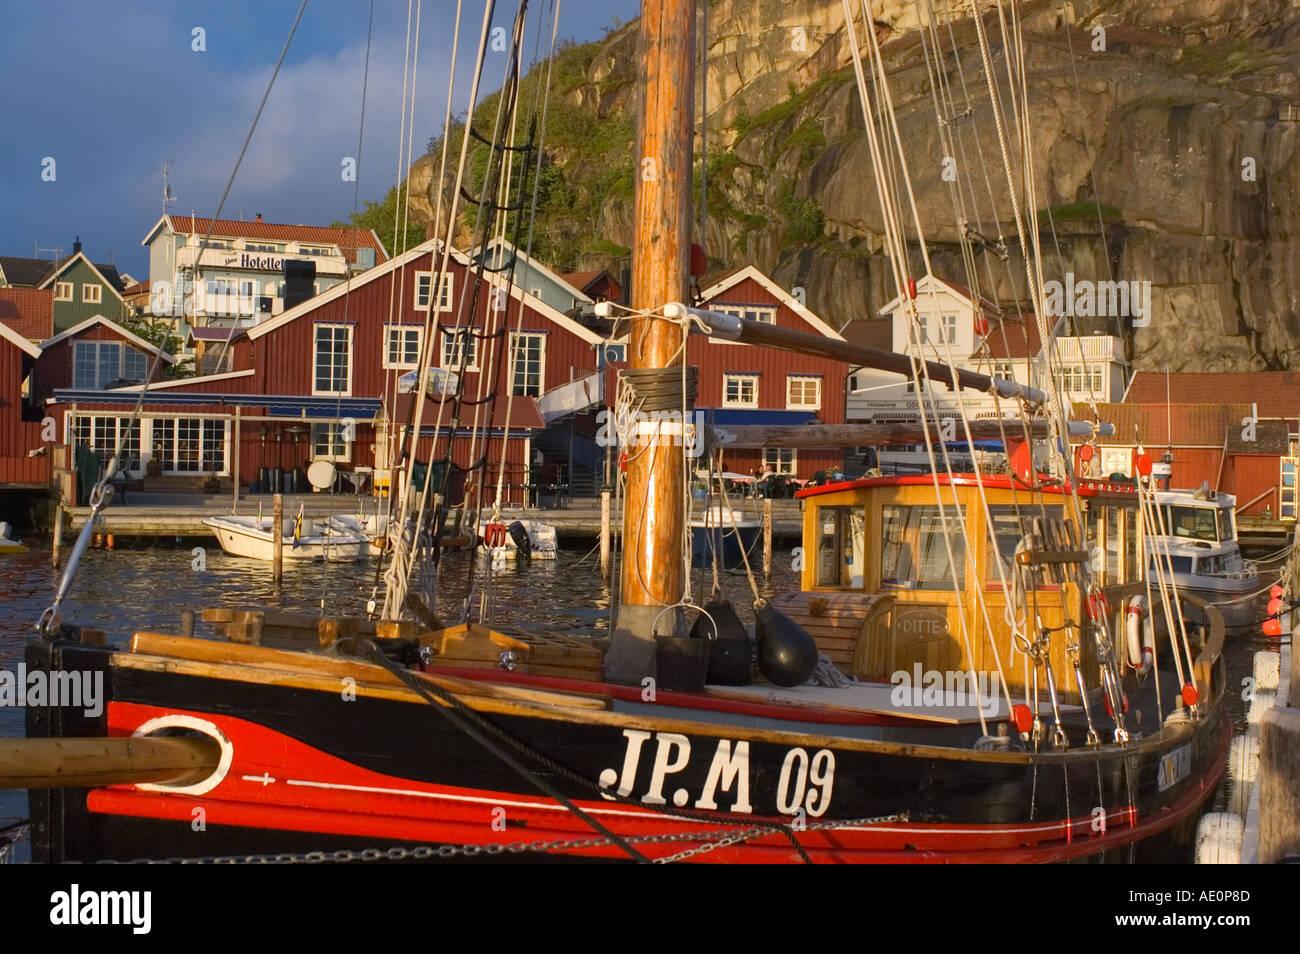 Sweden, Fjallbacka, Fishing boat in harbor Stock Photo